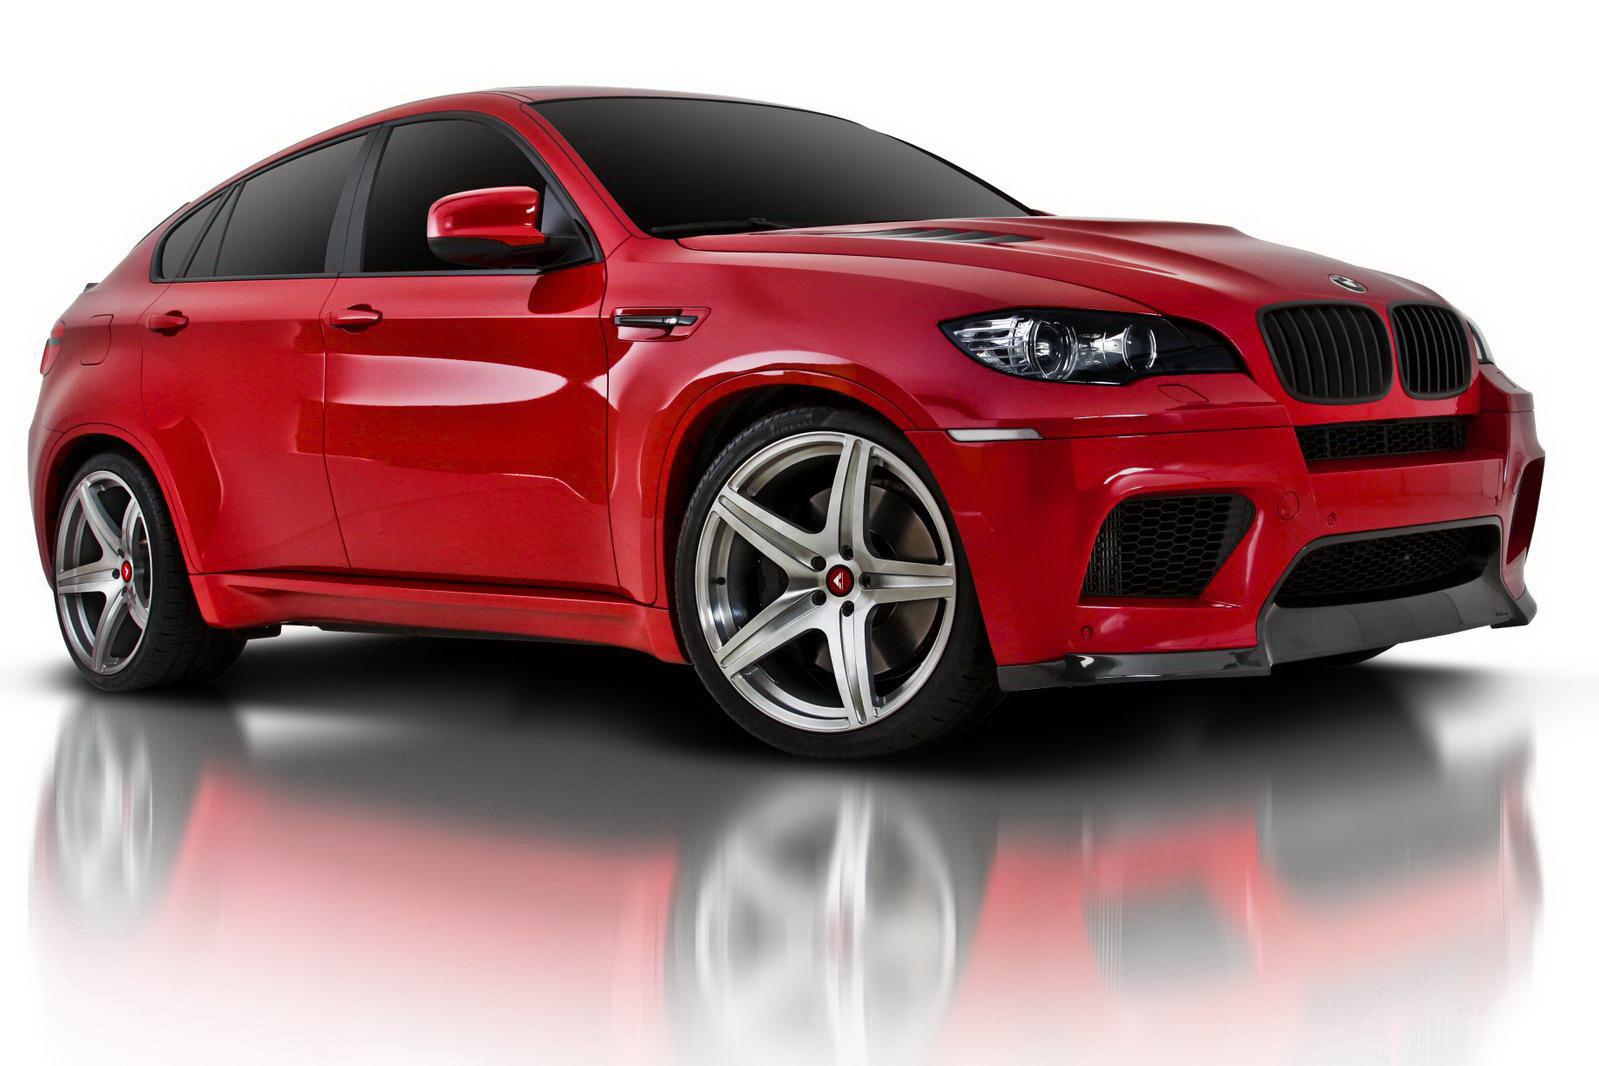 http://4.bp.blogspot.com/-lemj9hBotag/TugLVqtKrPI/AAAAAAAACMM/XTyF97B5I2E/s1600/BMW-X6-5.jpg